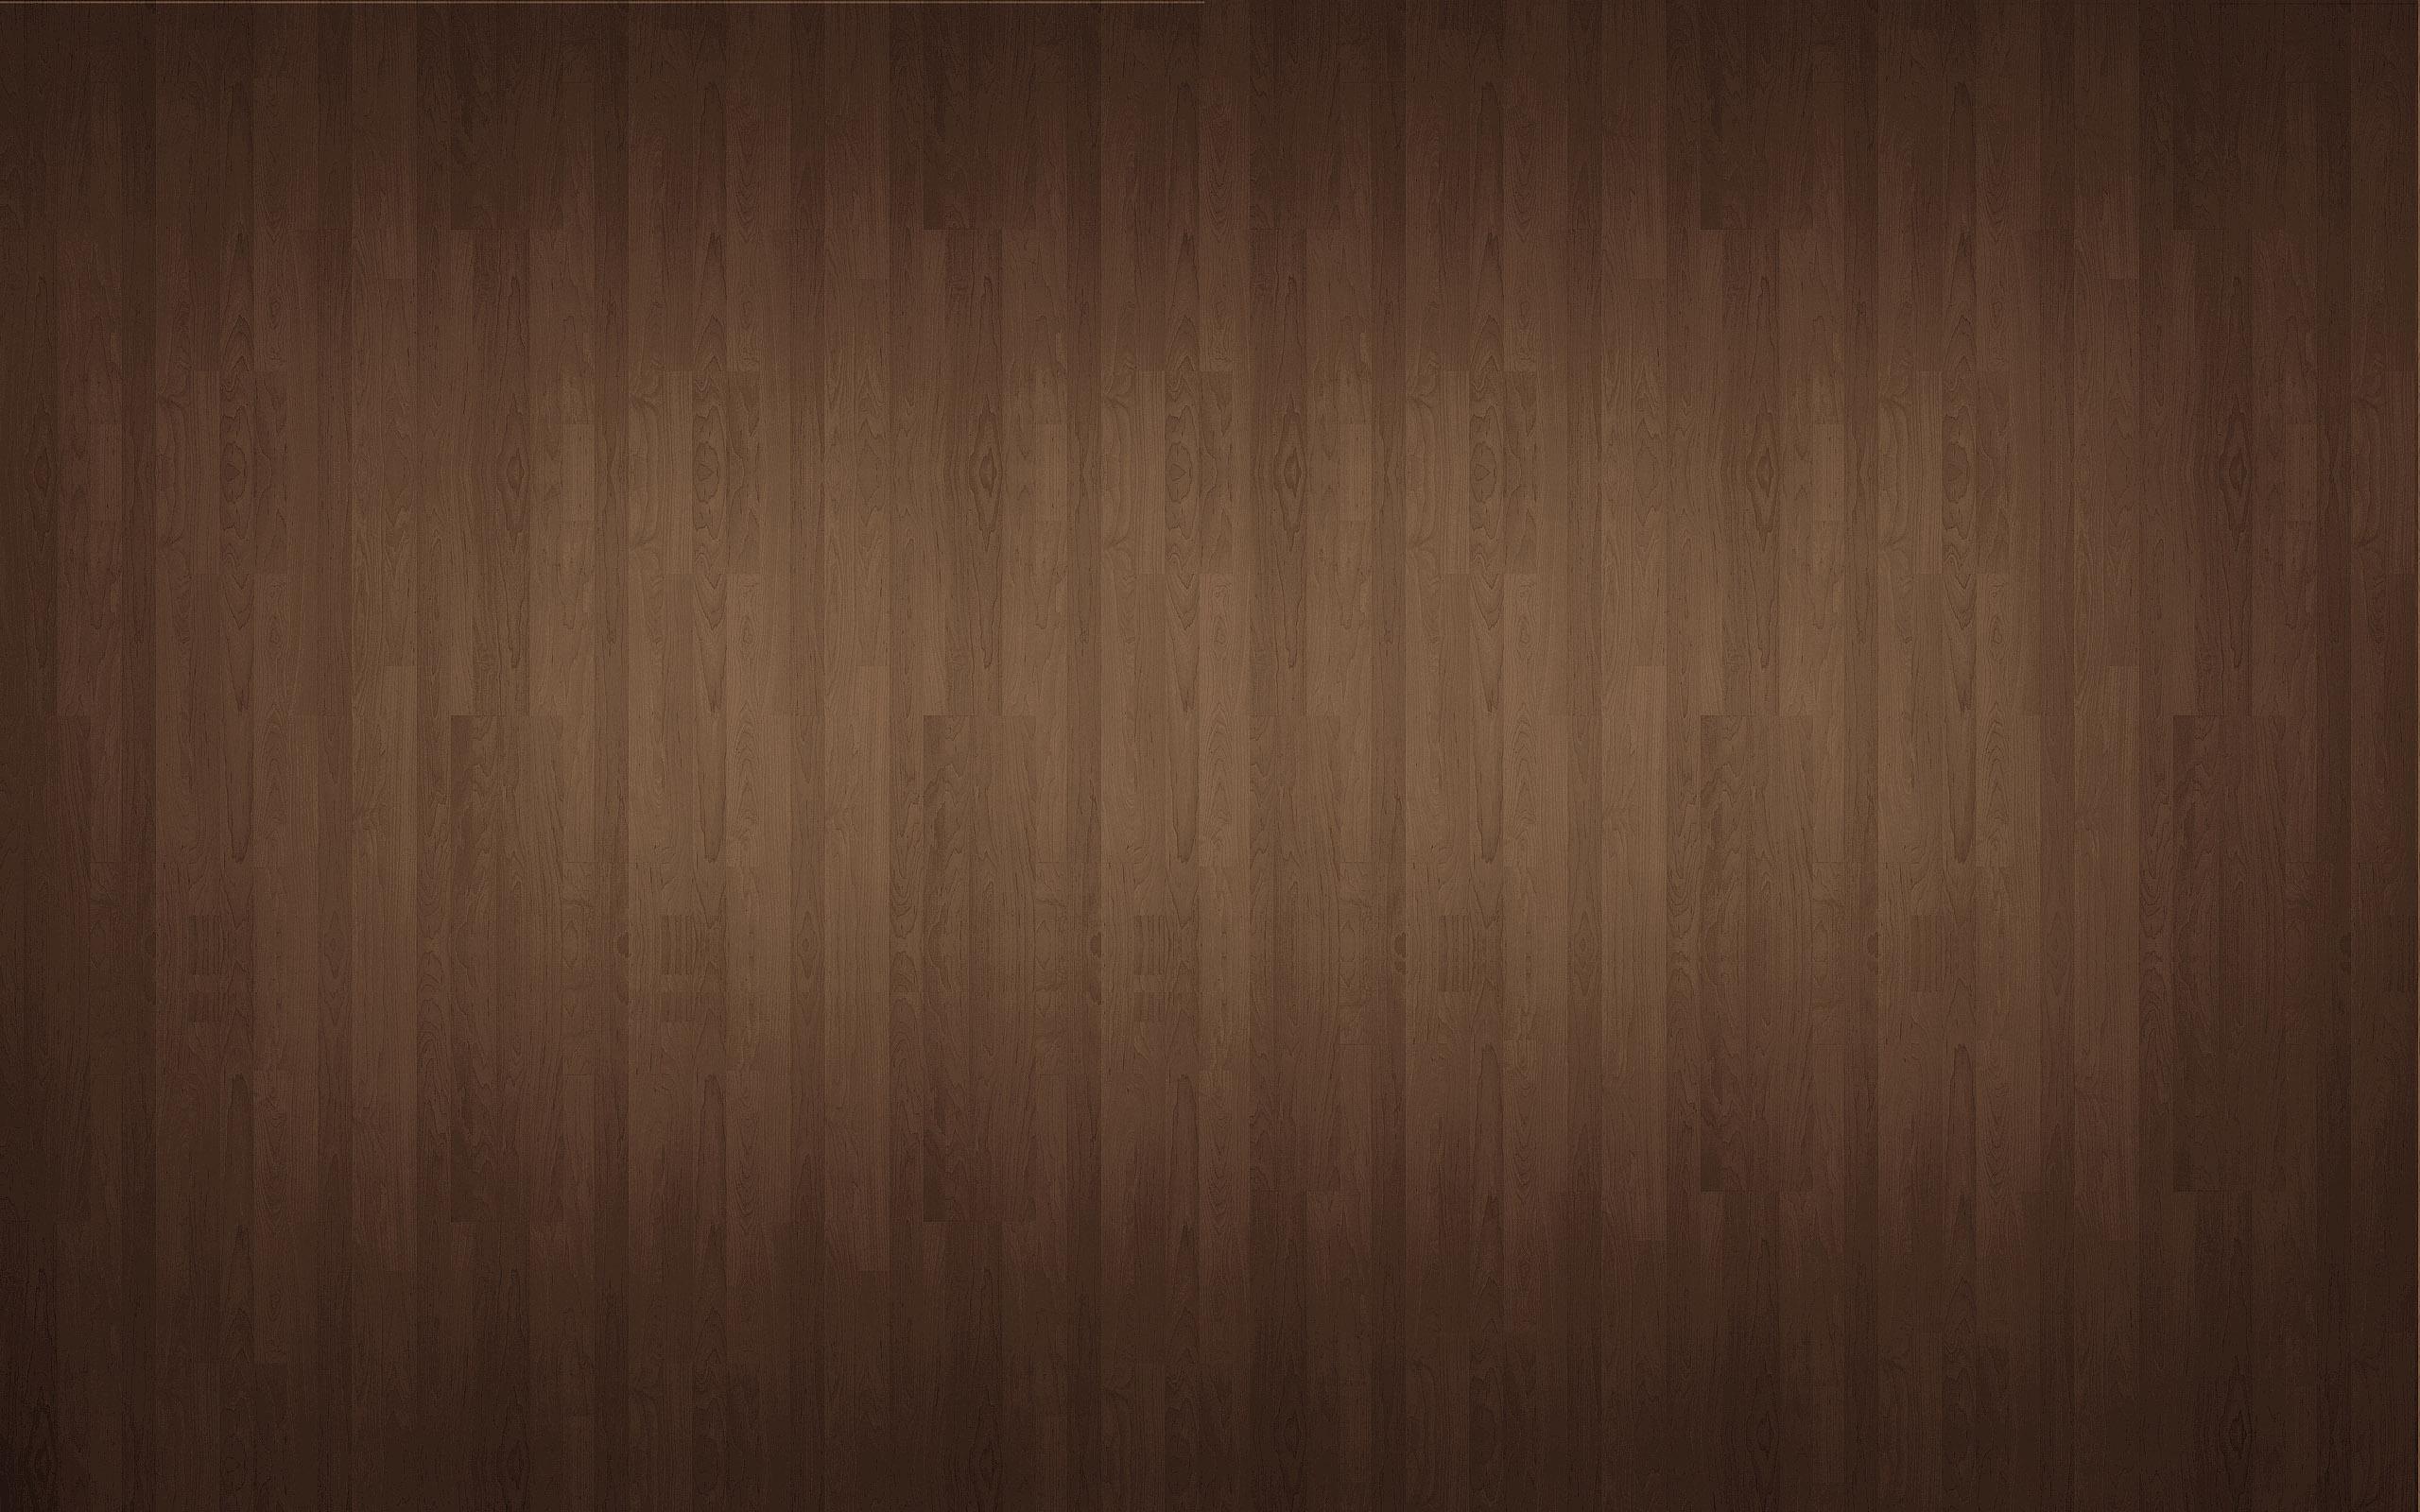 fondos marrones imagui. Black Bedroom Furniture Sets. Home Design Ideas